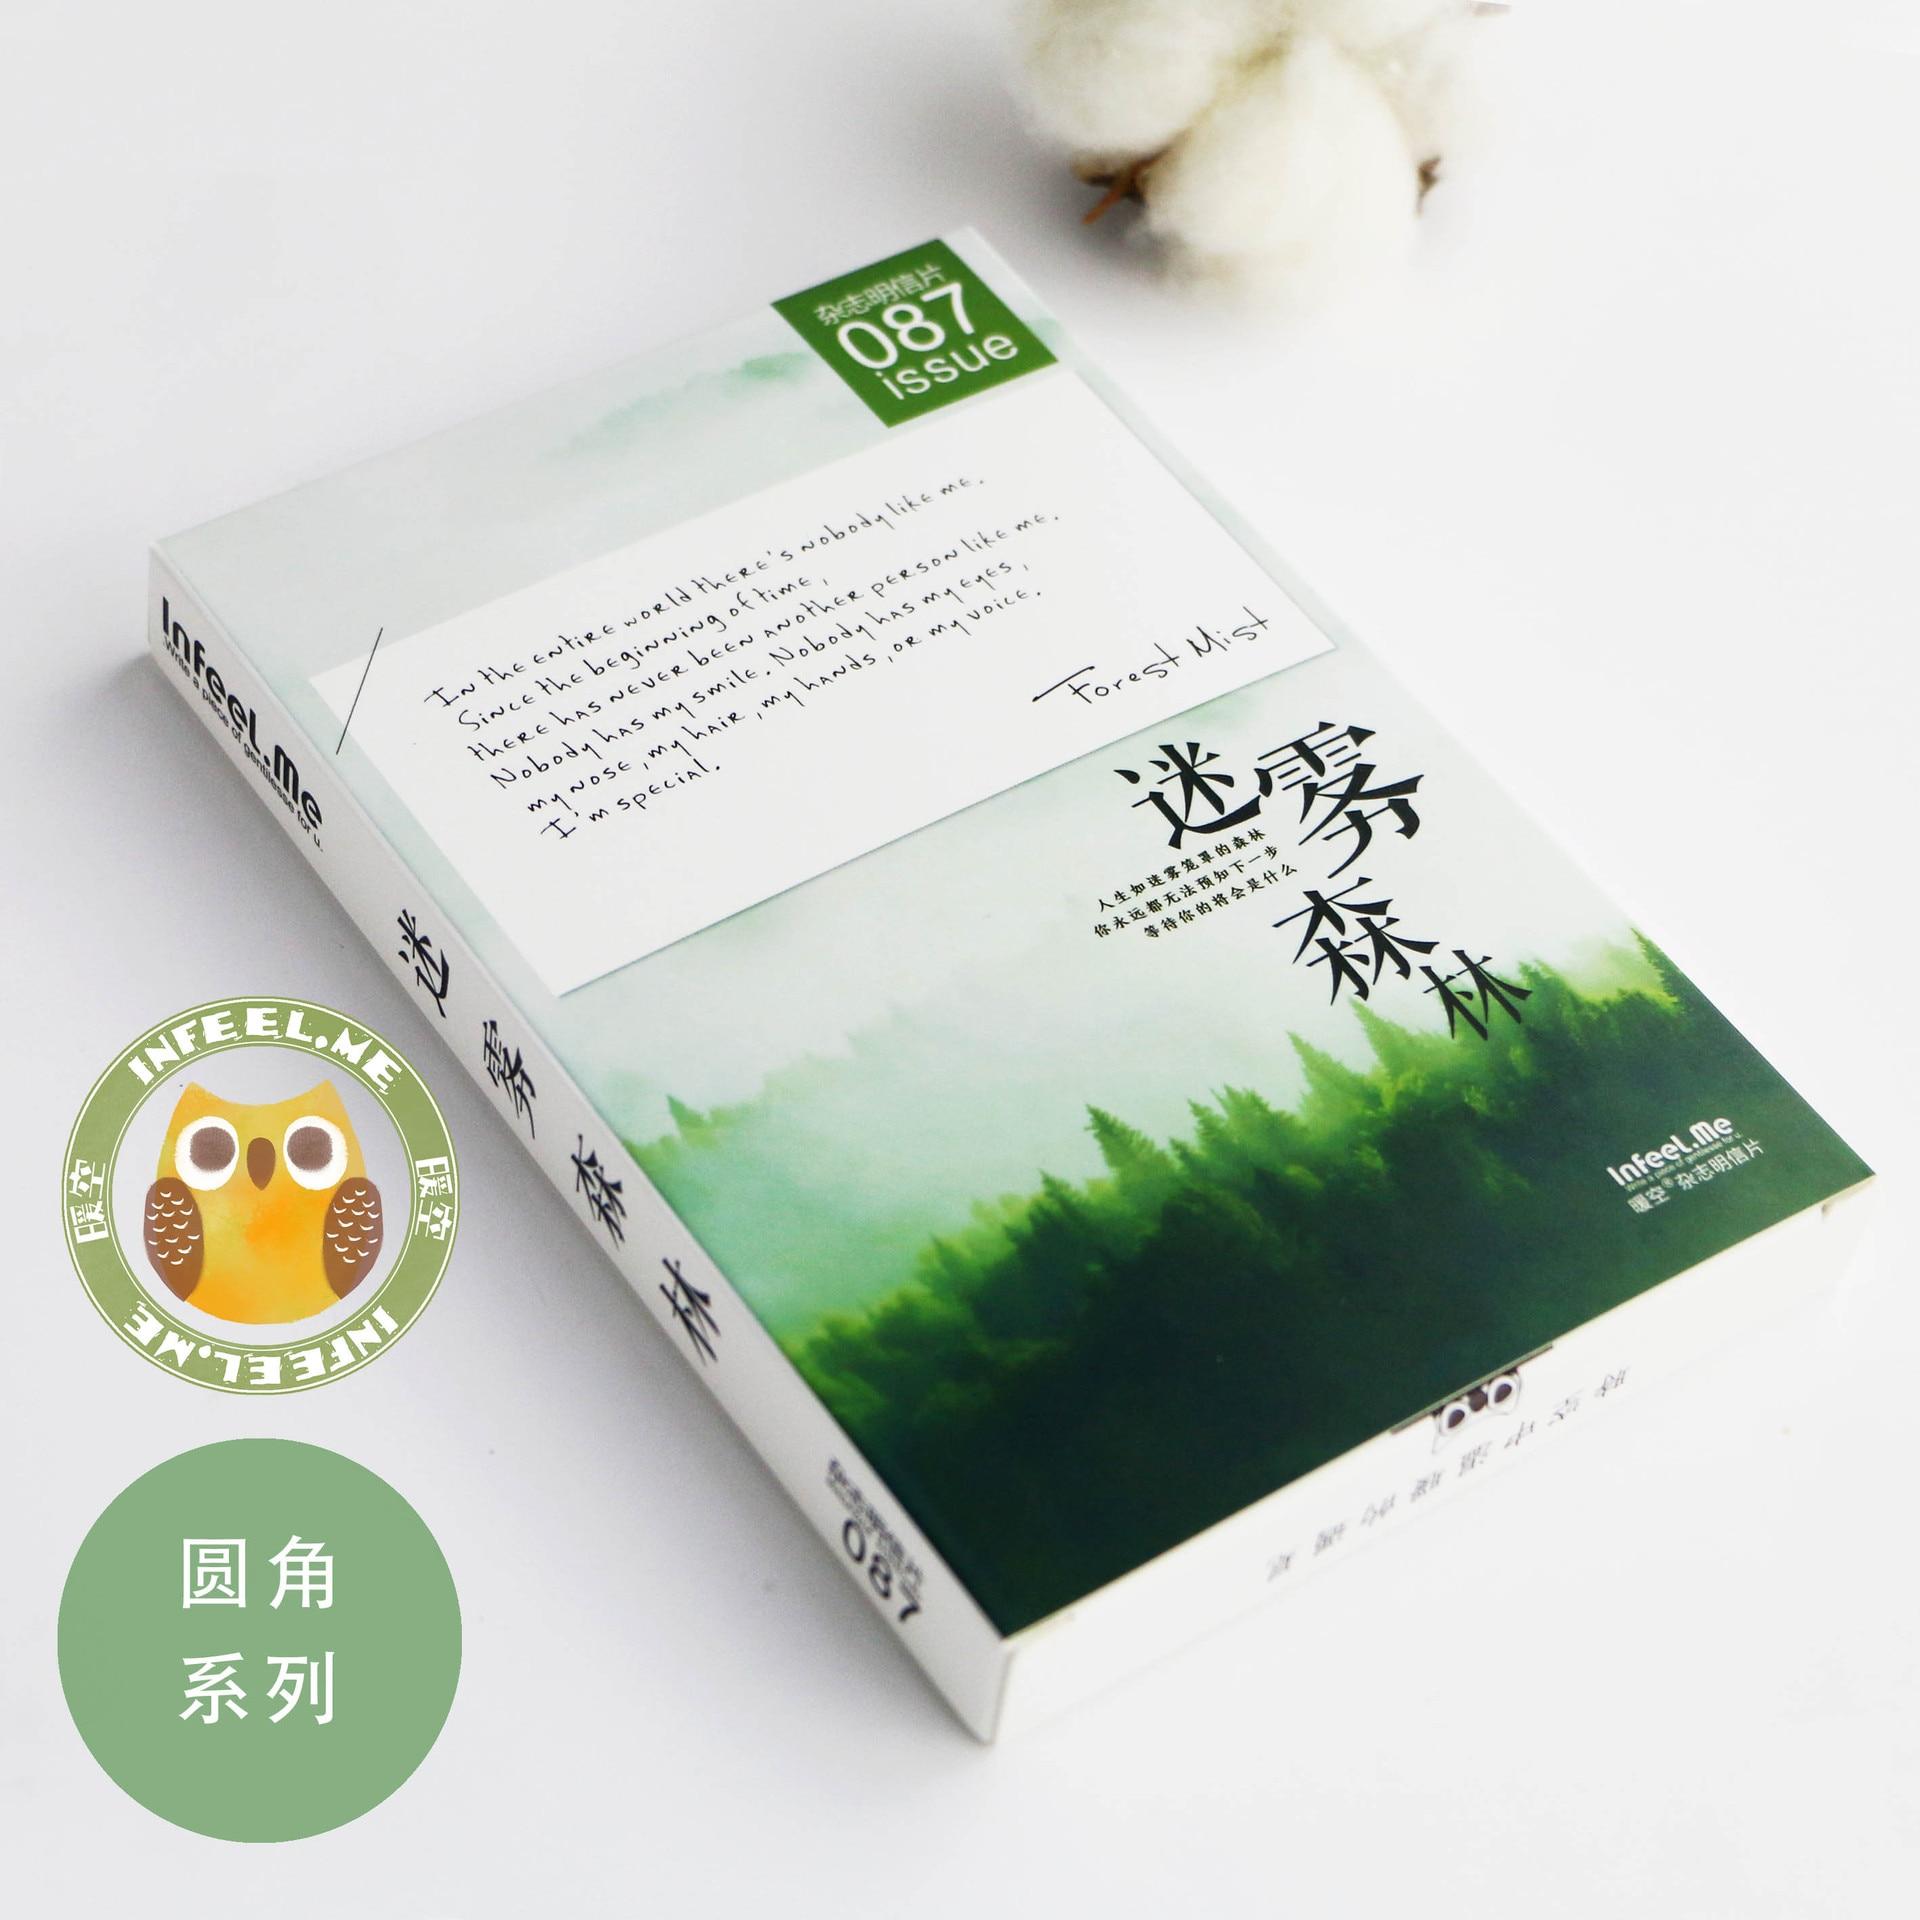 30 pcs/pack Cute Korean Stationery Natural Forest Mist Round Corner Postcards Bookmark Gift Cards DIY Paper Cards 350G Paper цены